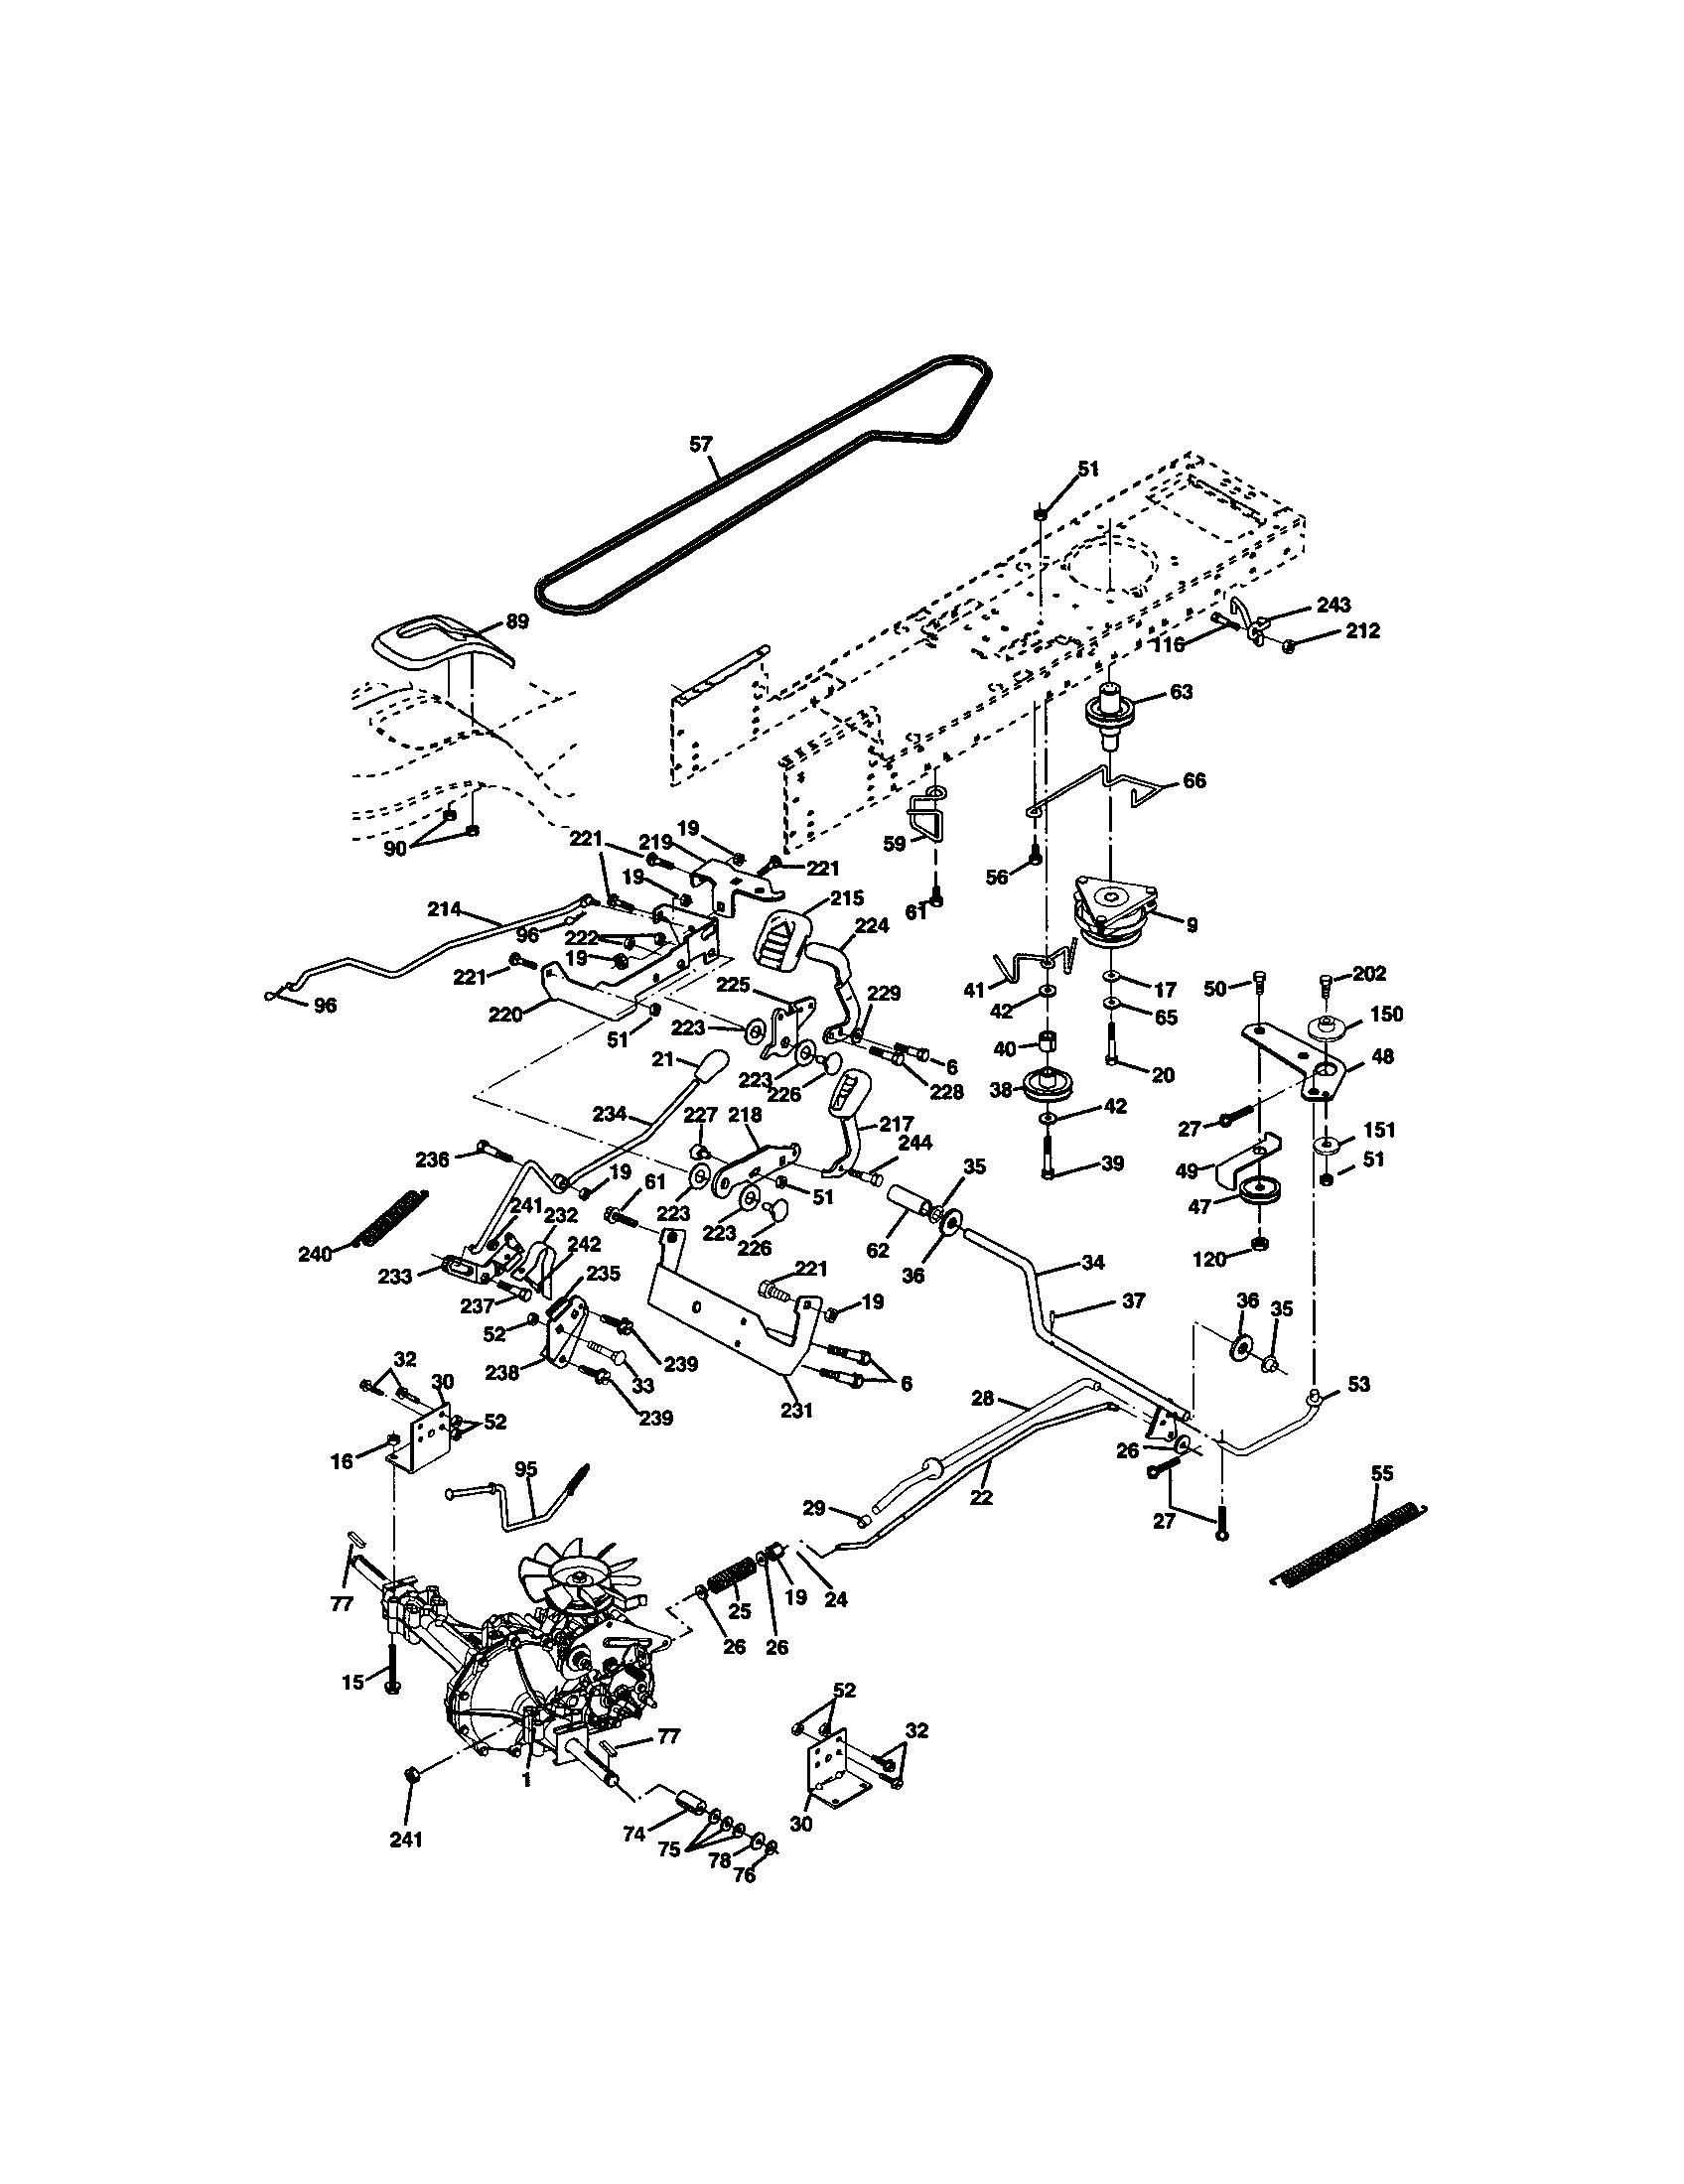 Craftsman Riding Mower Parts Diagram Craftsman Model Lawn